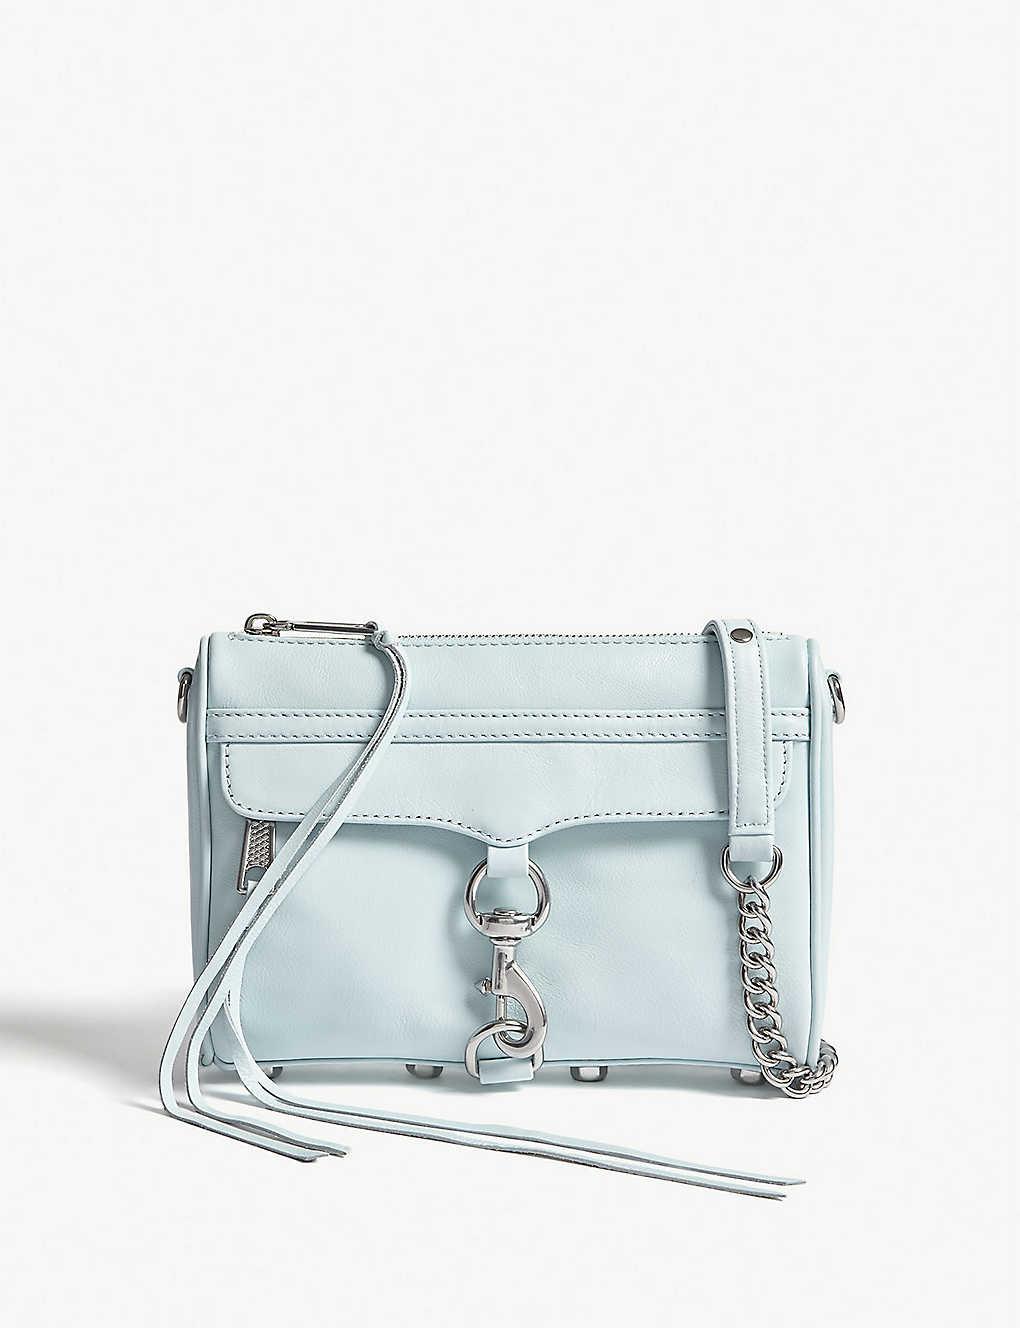 87b72d512 REBECCA MINKOFF - Mini Mac grained leather cross-body bag ...